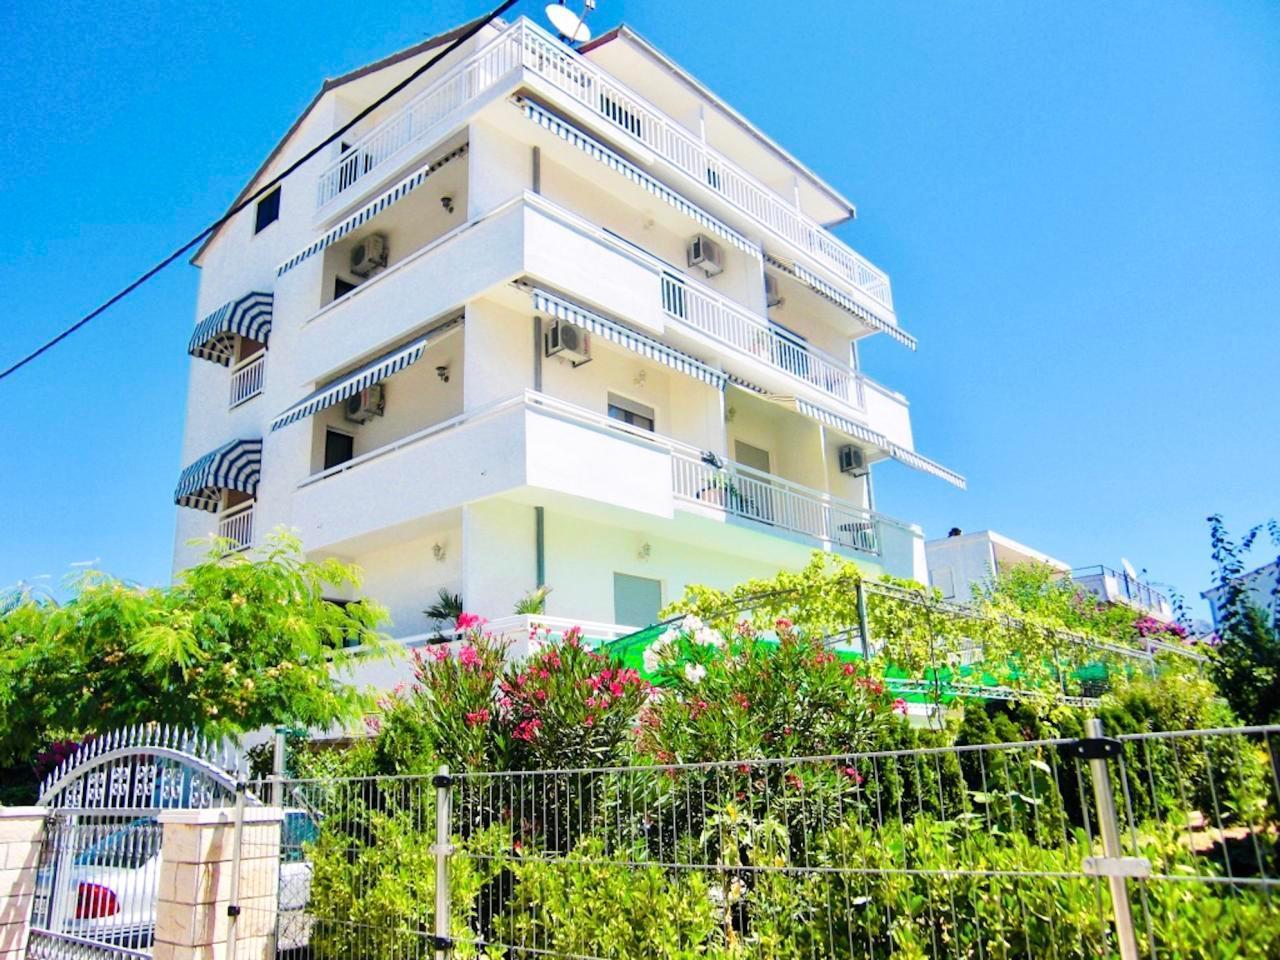 Ferienwohnung Apartmenthaus Ruza 7 - Studio (98388), Kaštel Štafilić, , Dalmatien, Kroatien, Bild 1